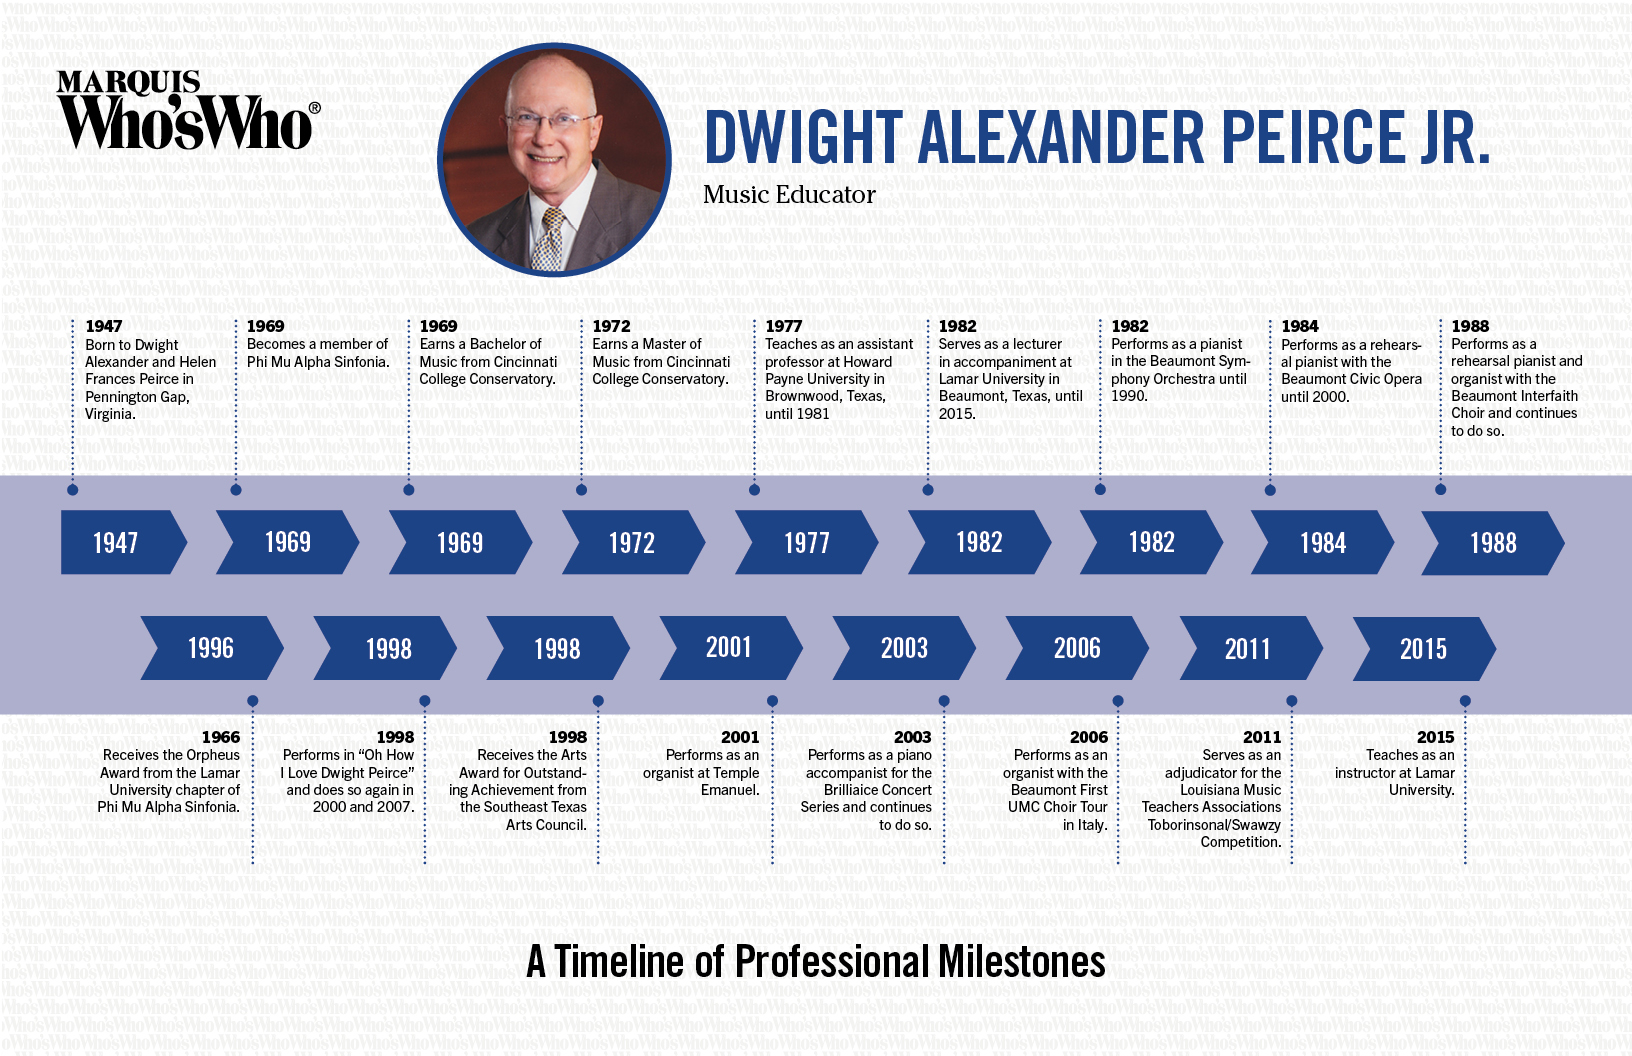 Dwight Peirce